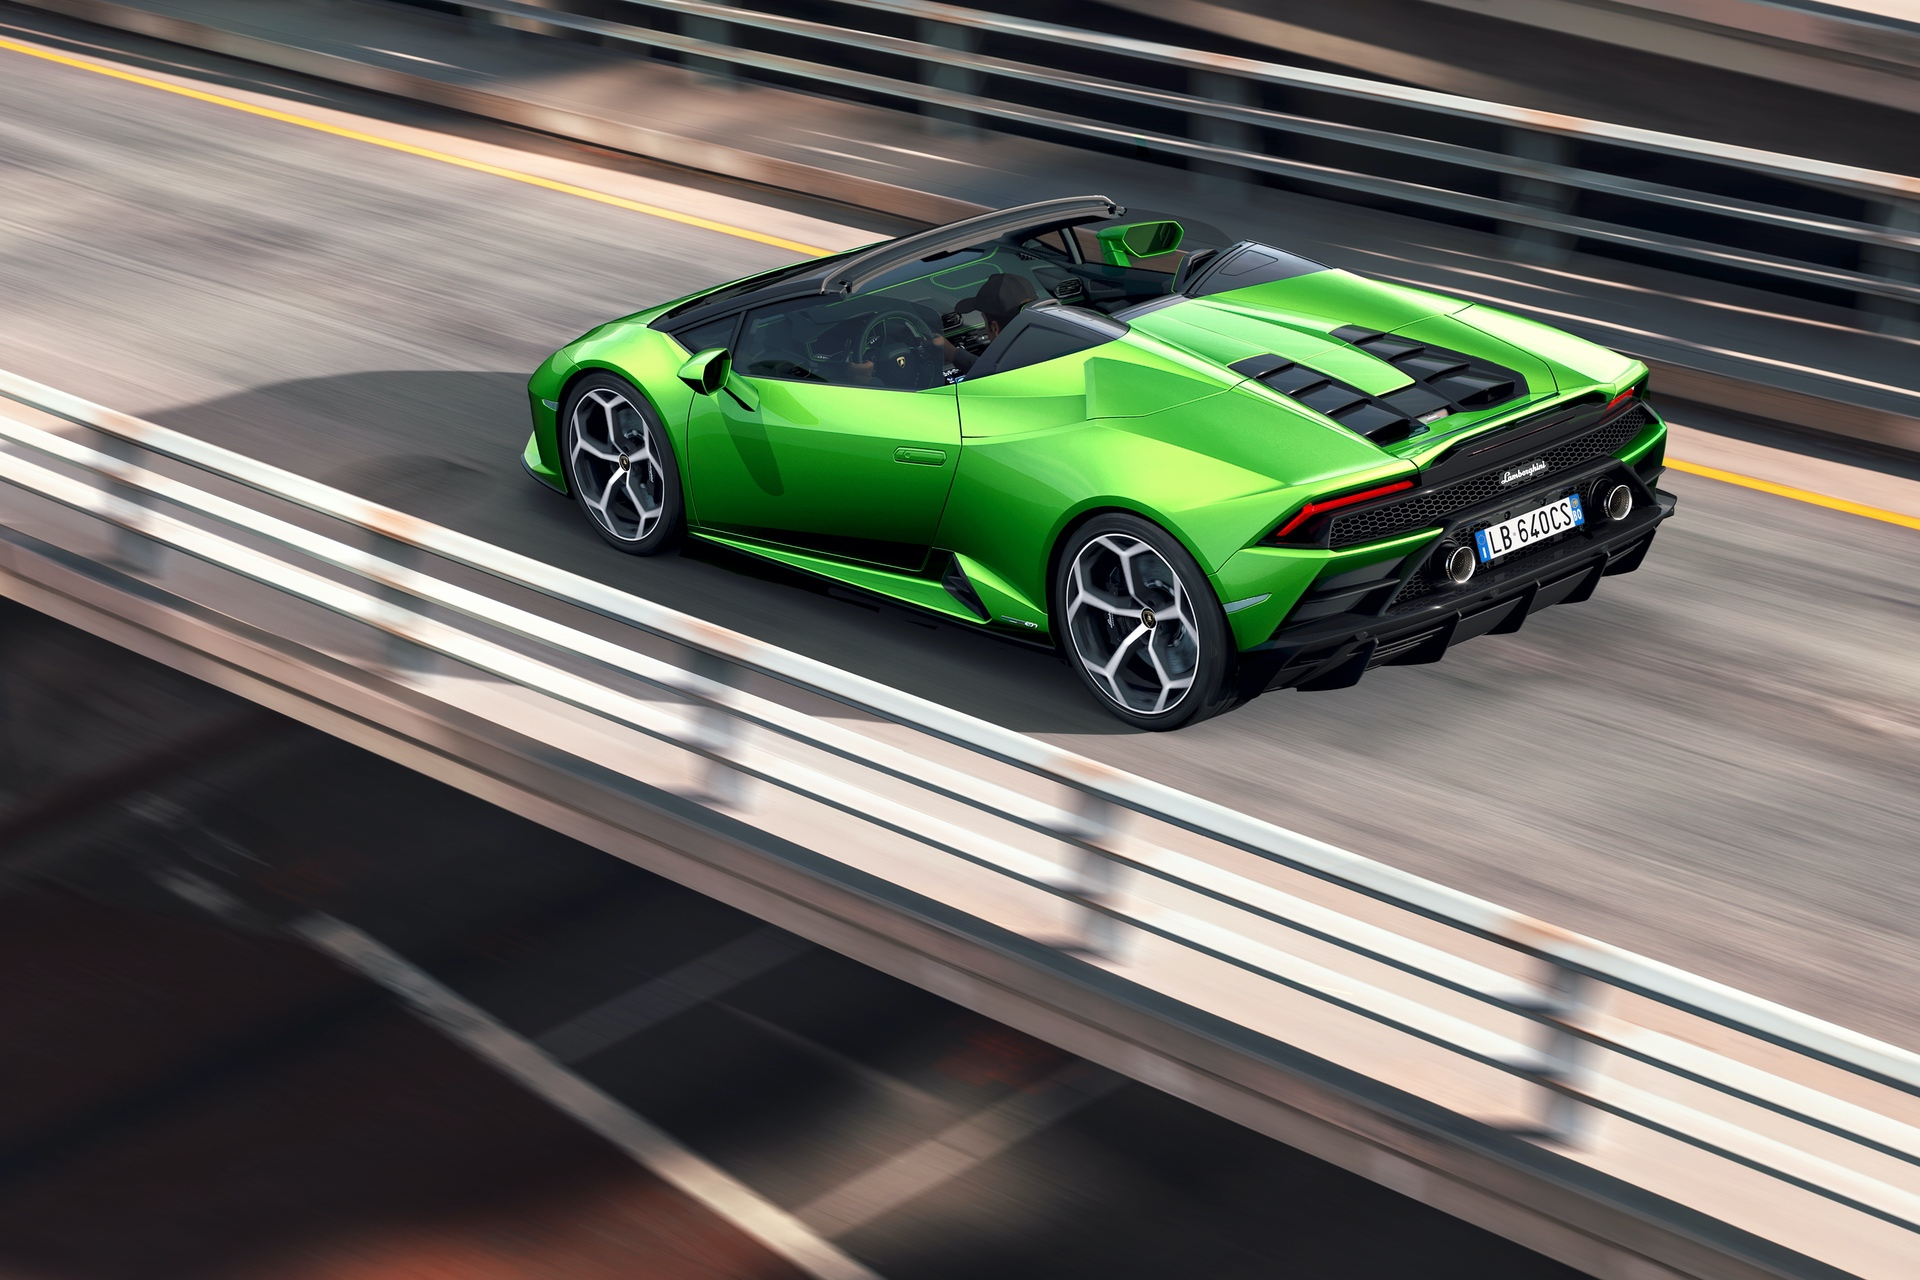 Lamborghini_Huracan_Evo_Spyder_0022